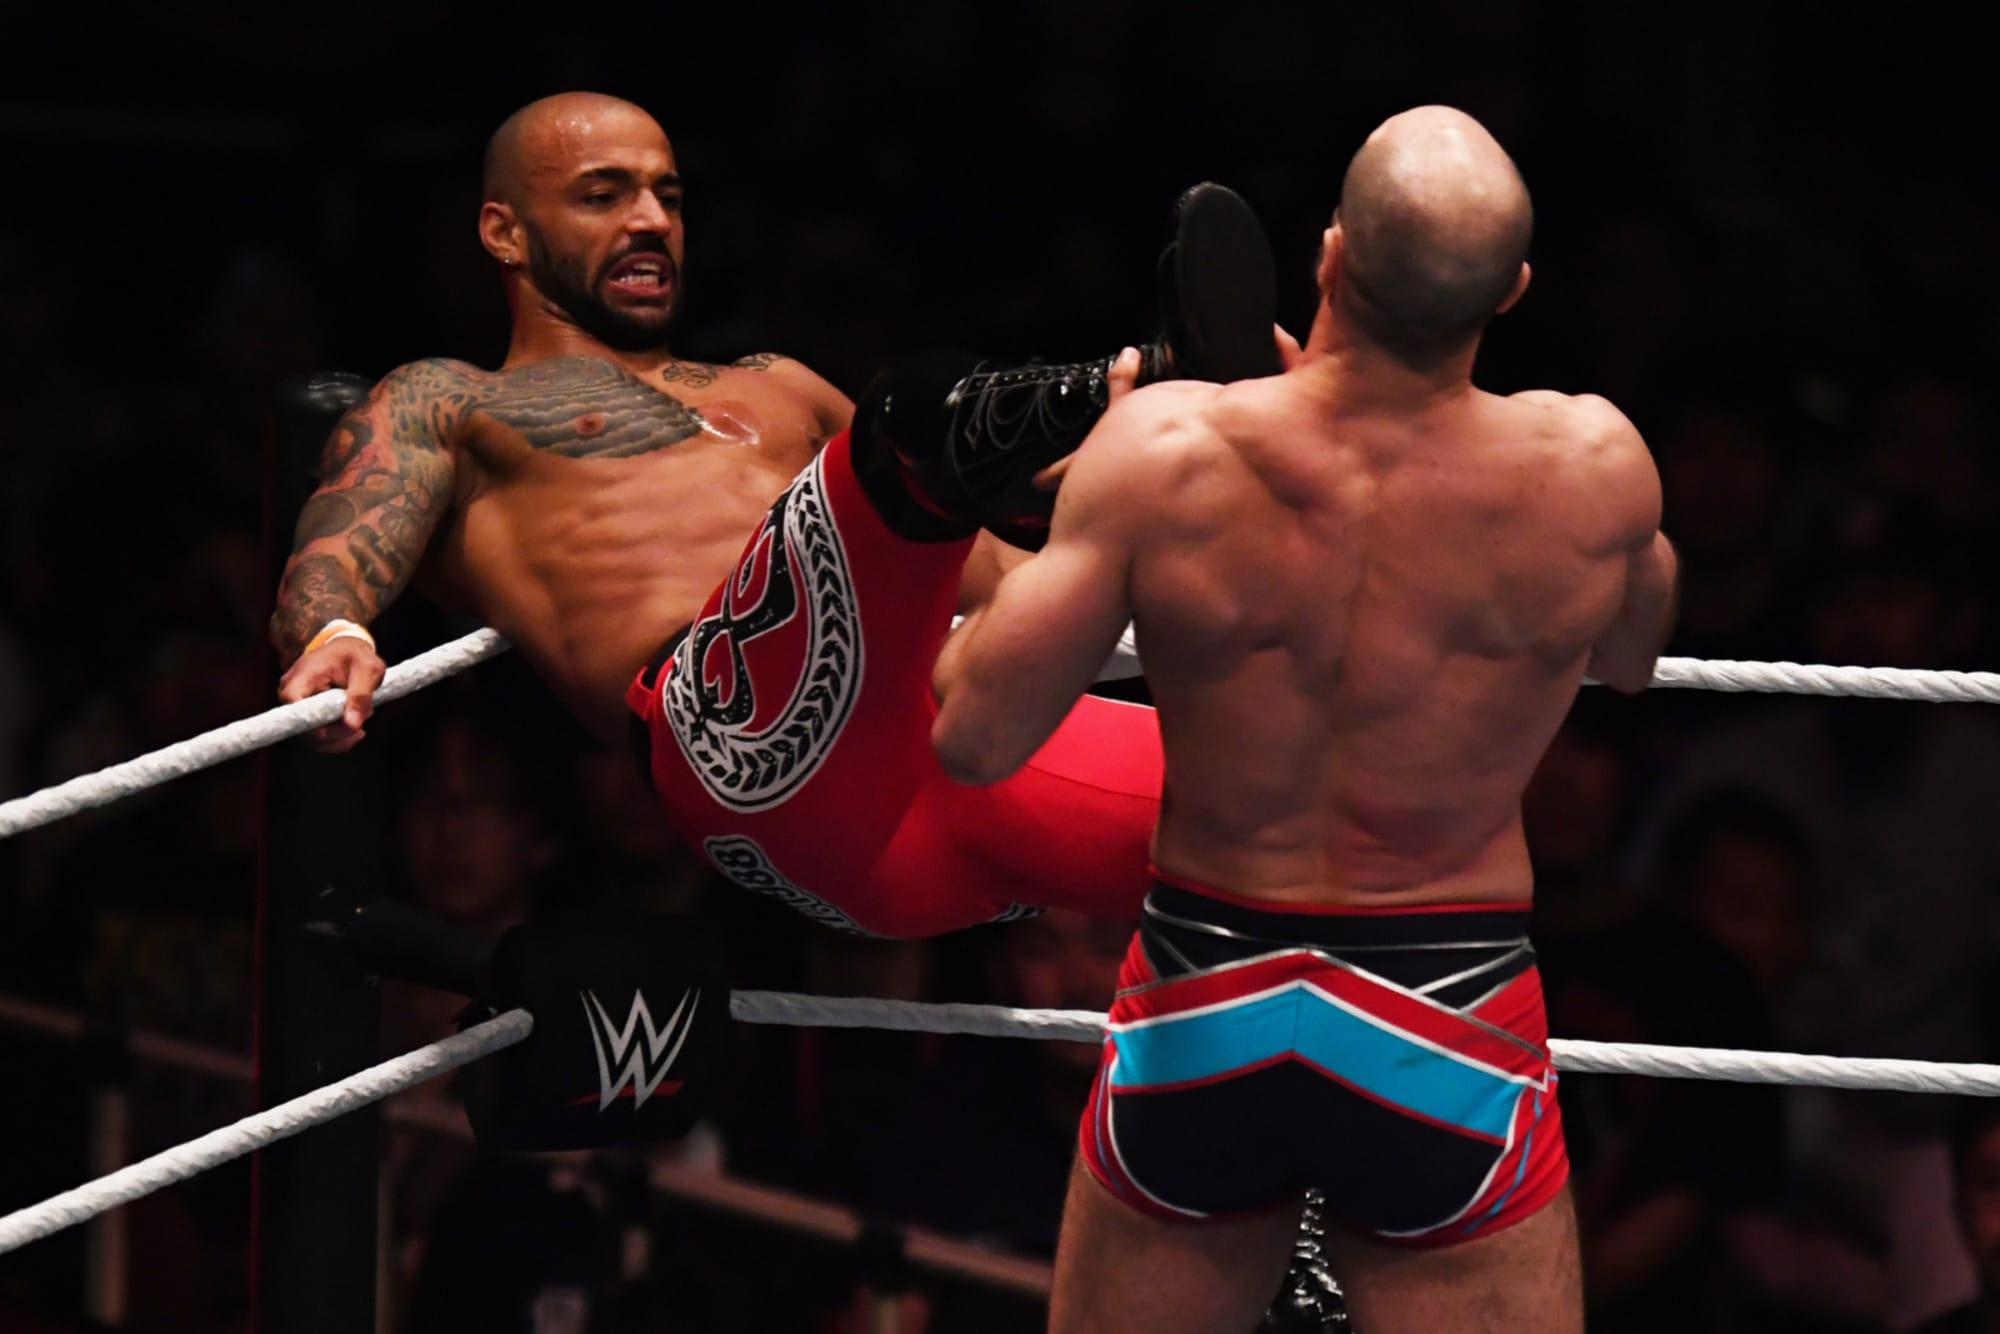 WWE Raw: Hit/Miss Jan. 18 – Ricochet vs. A.J. Styles